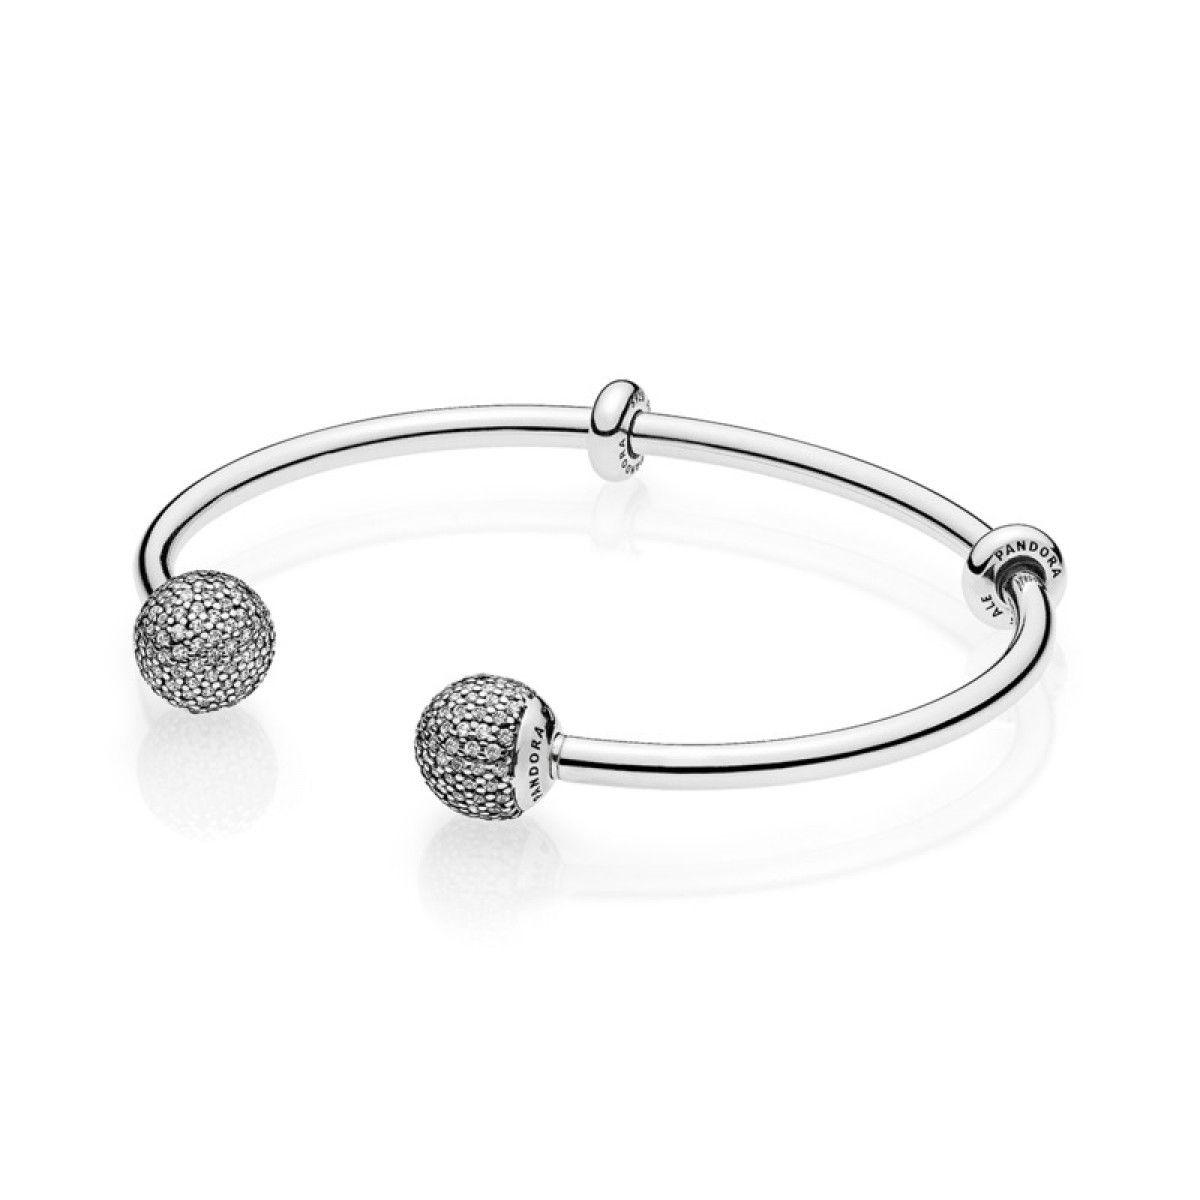 Moments Silver Open Bangle, Pavé Caps | Pandora bracelet charms ...